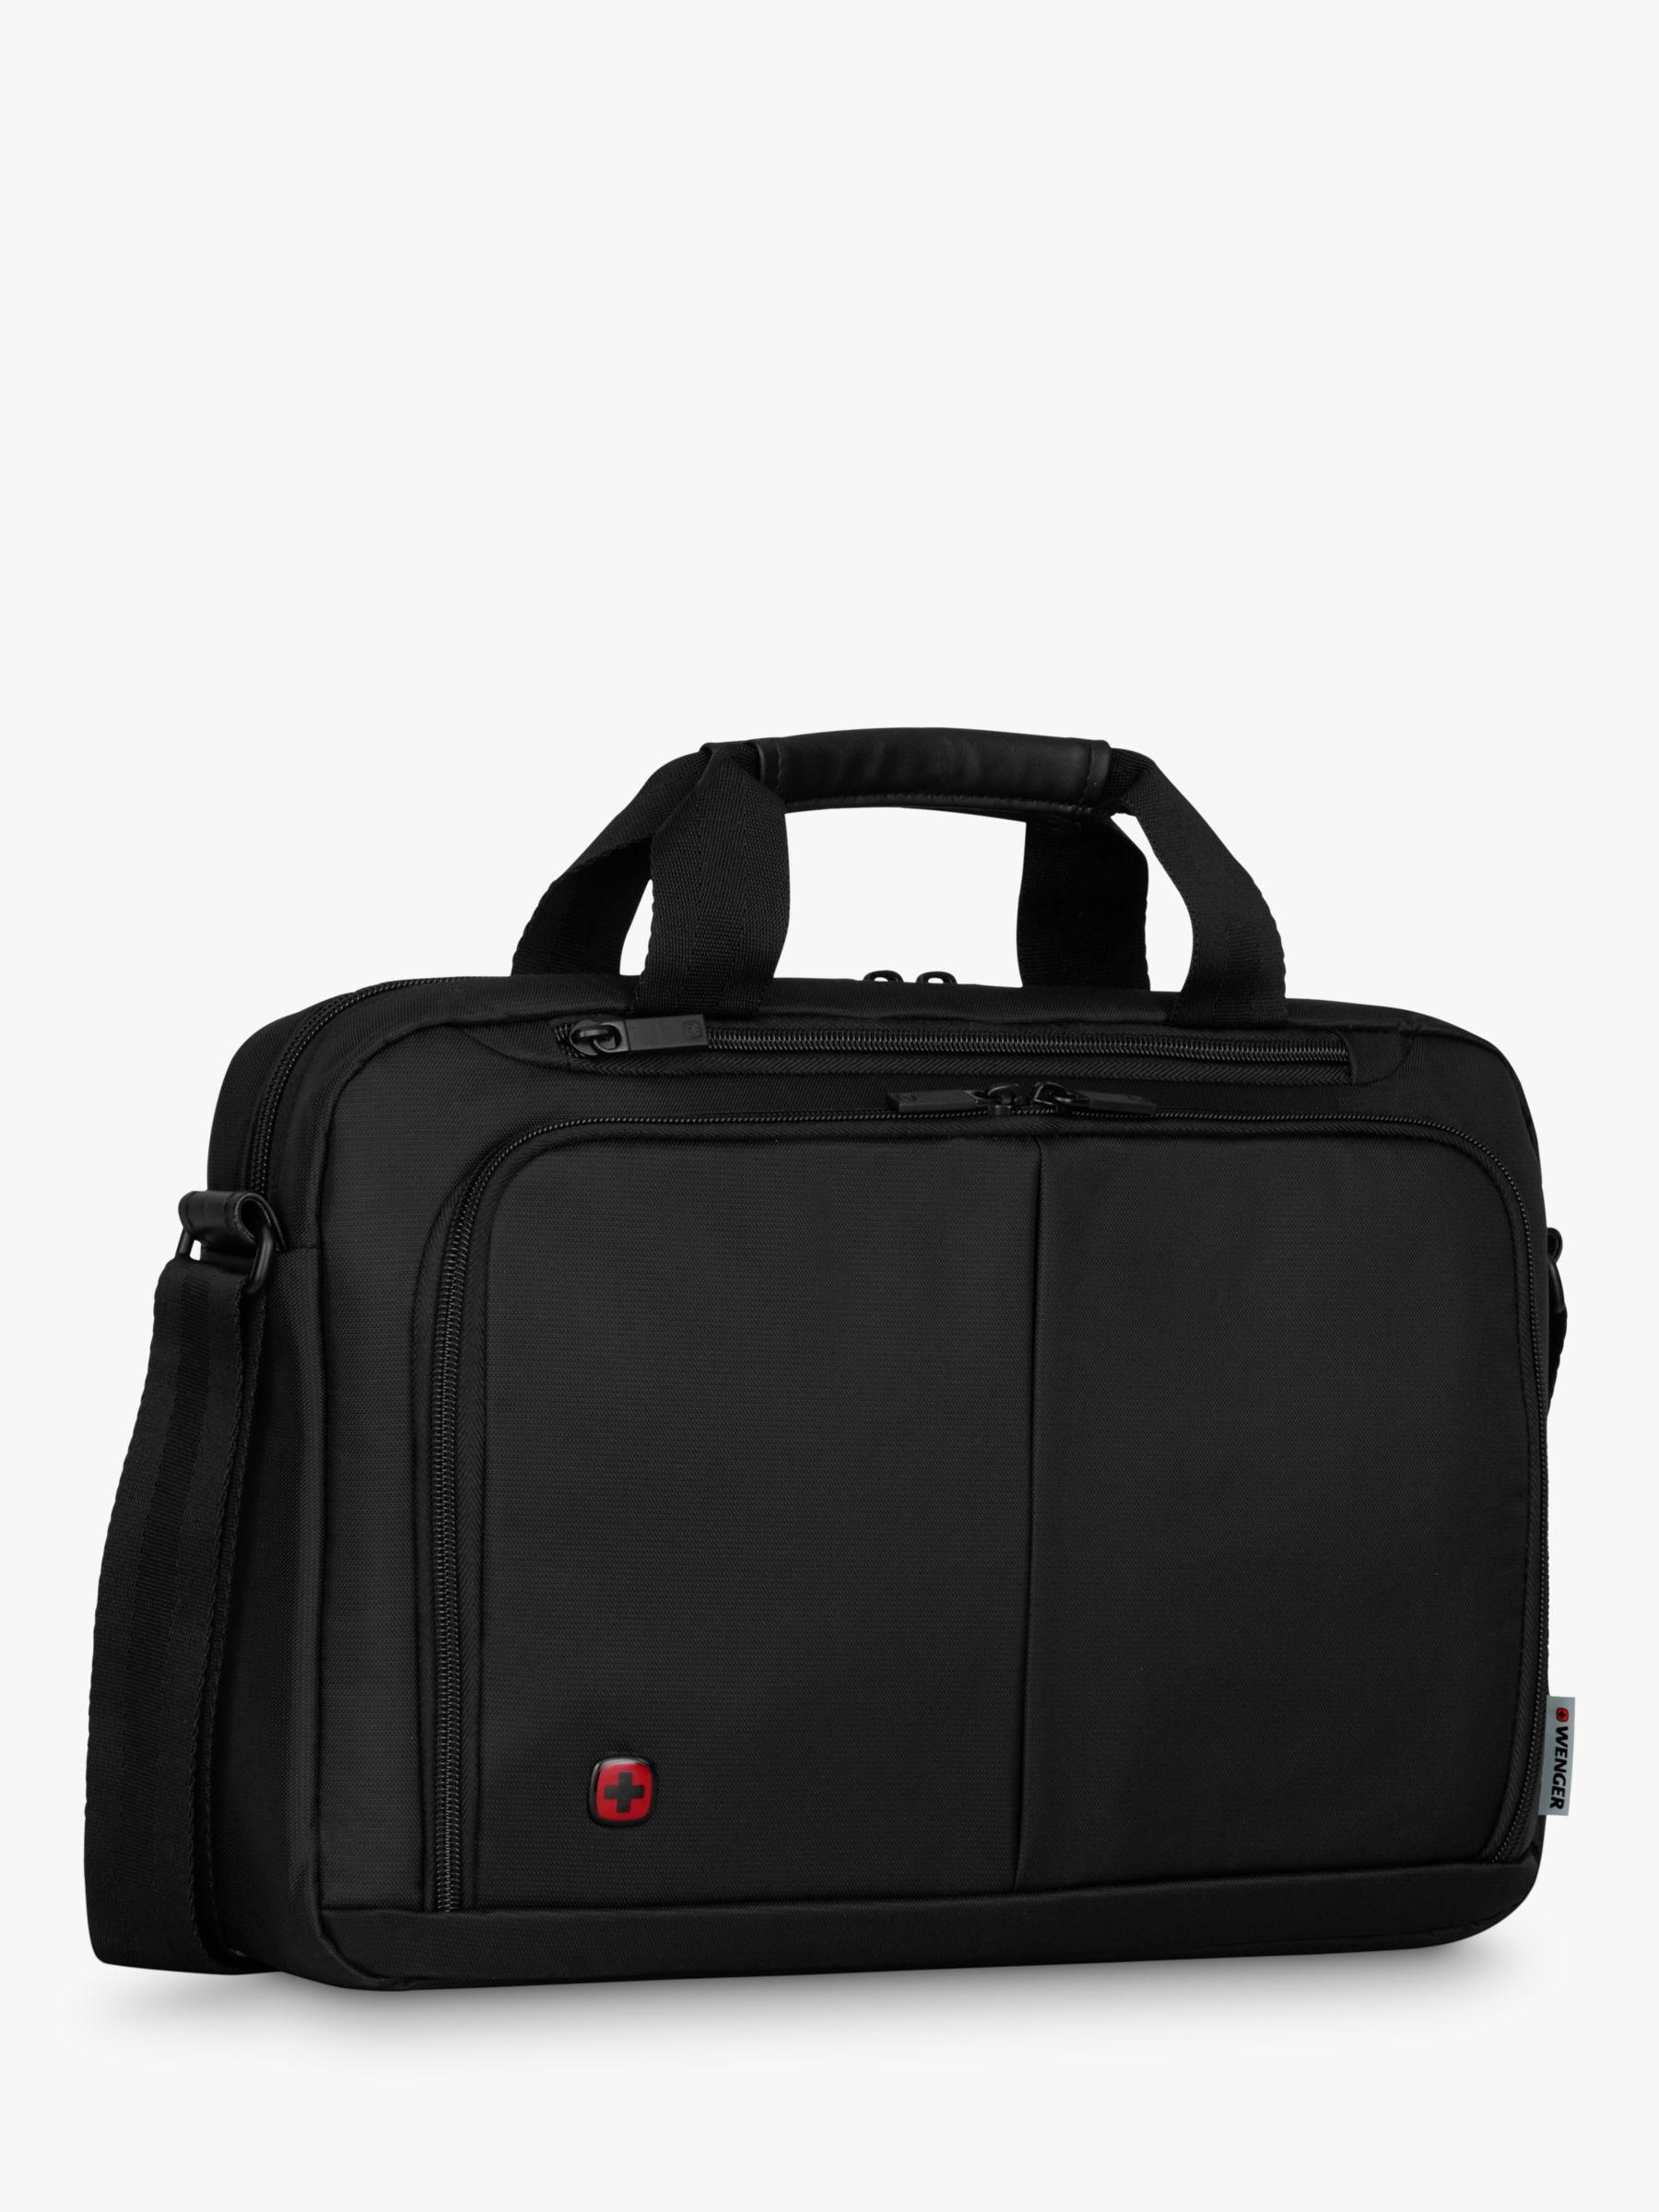 Wenger Wenger Source 14 Laptop Briefcase with Tablet Pocket